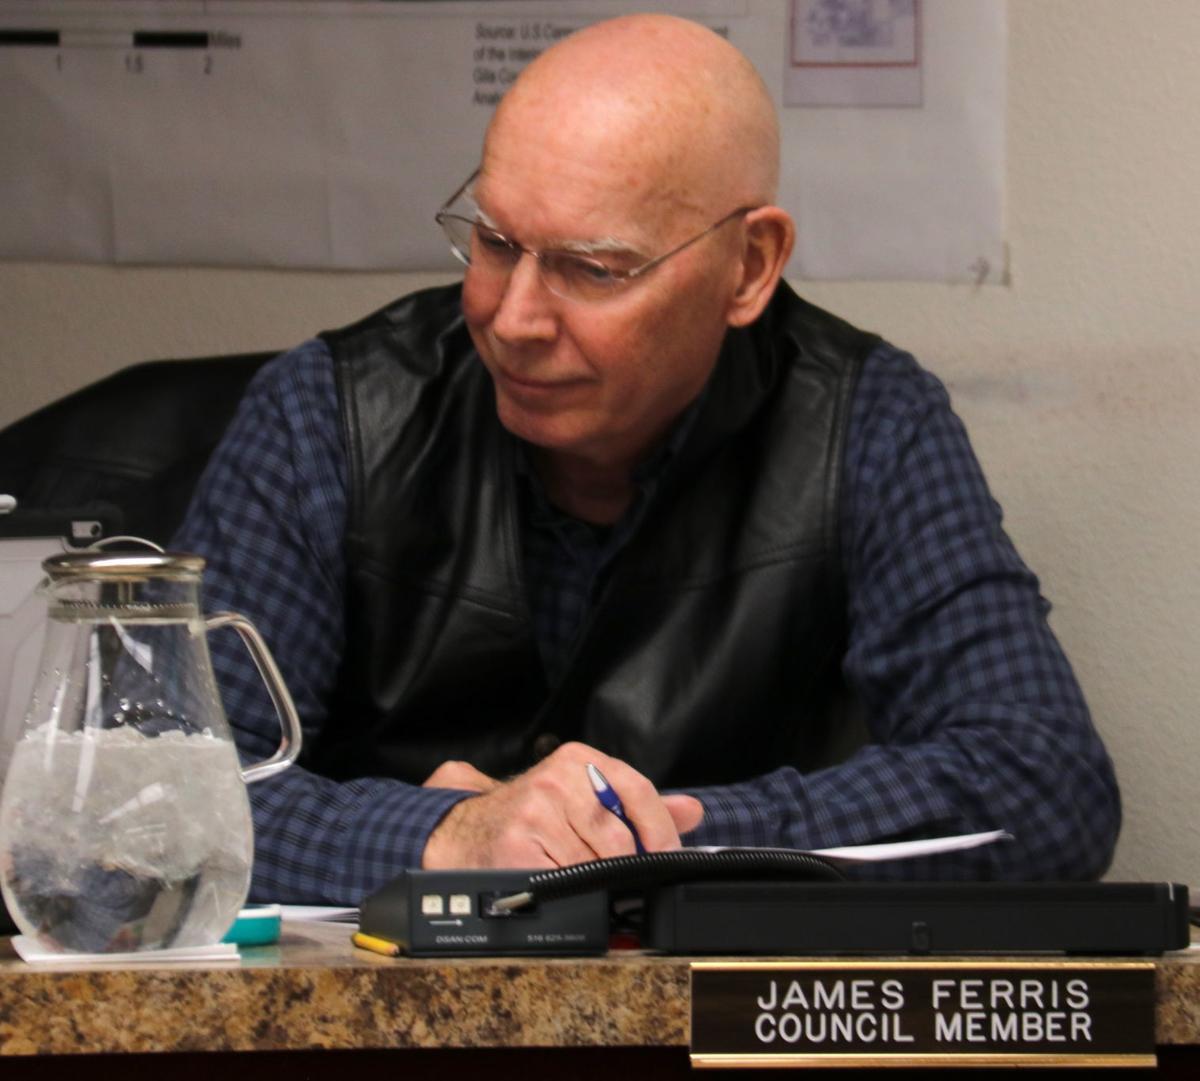 Jim Ferris Feb. 4 meeting